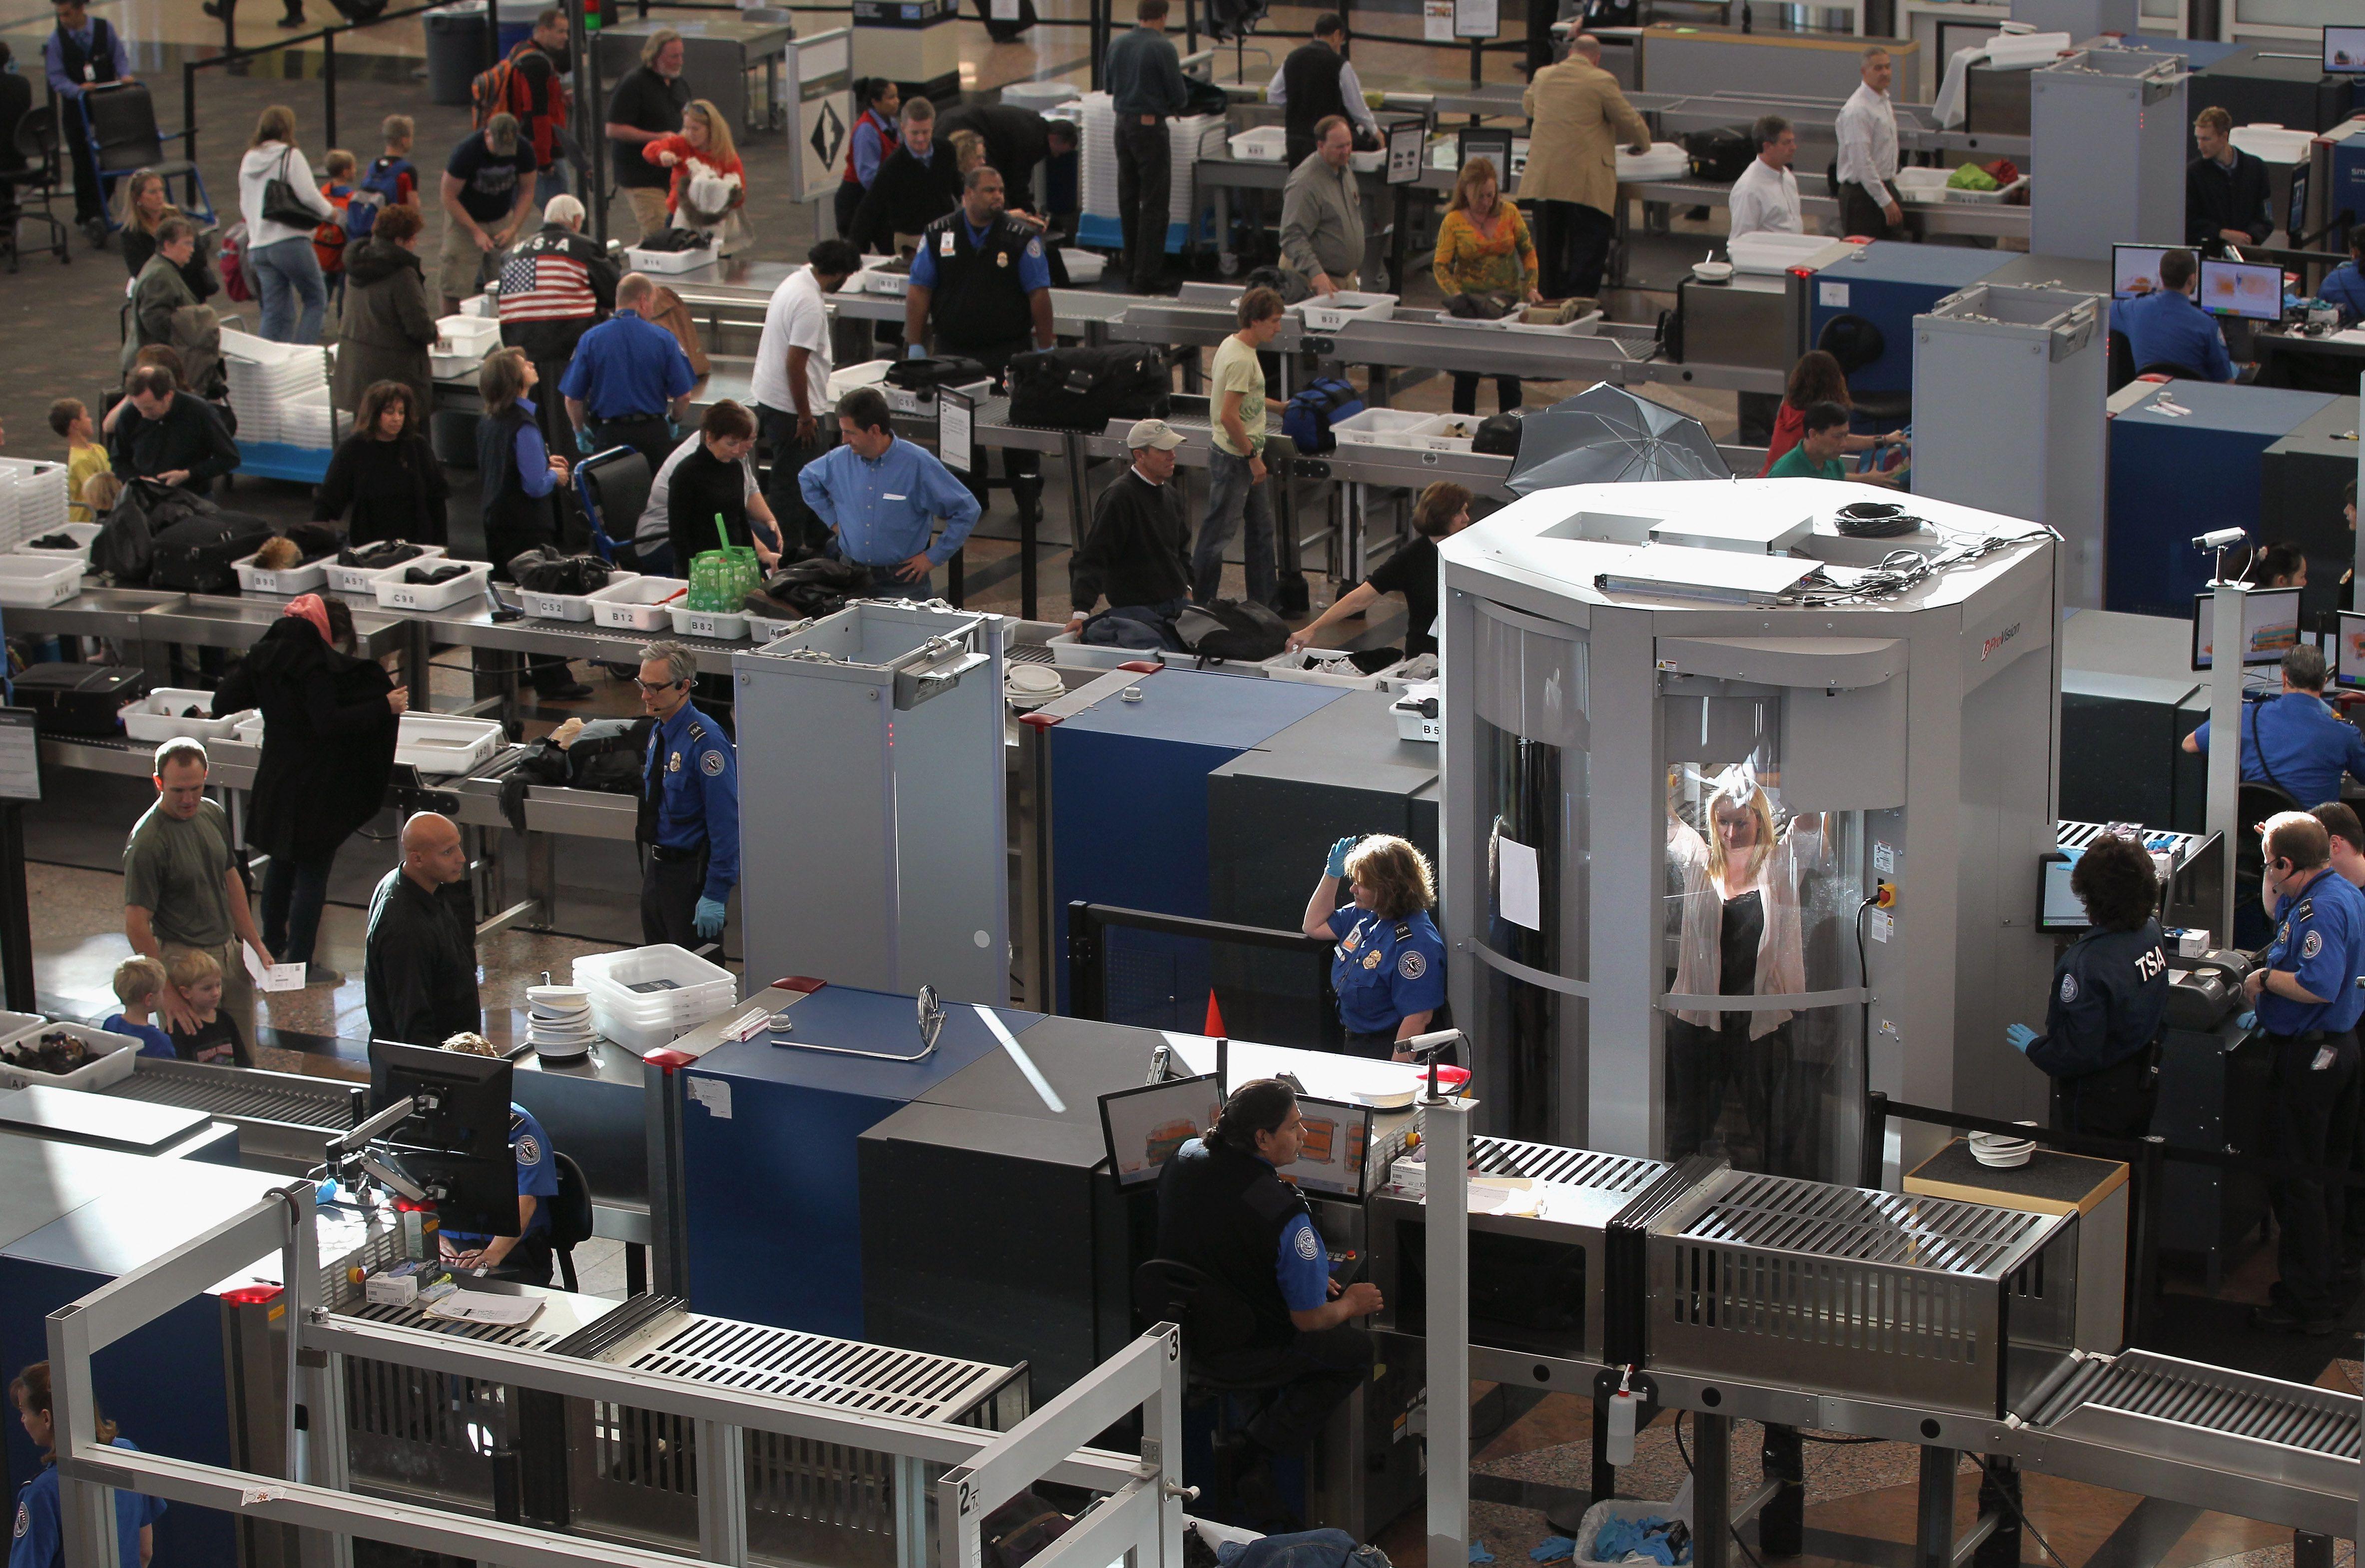 TSA Security Body Scanning Machines